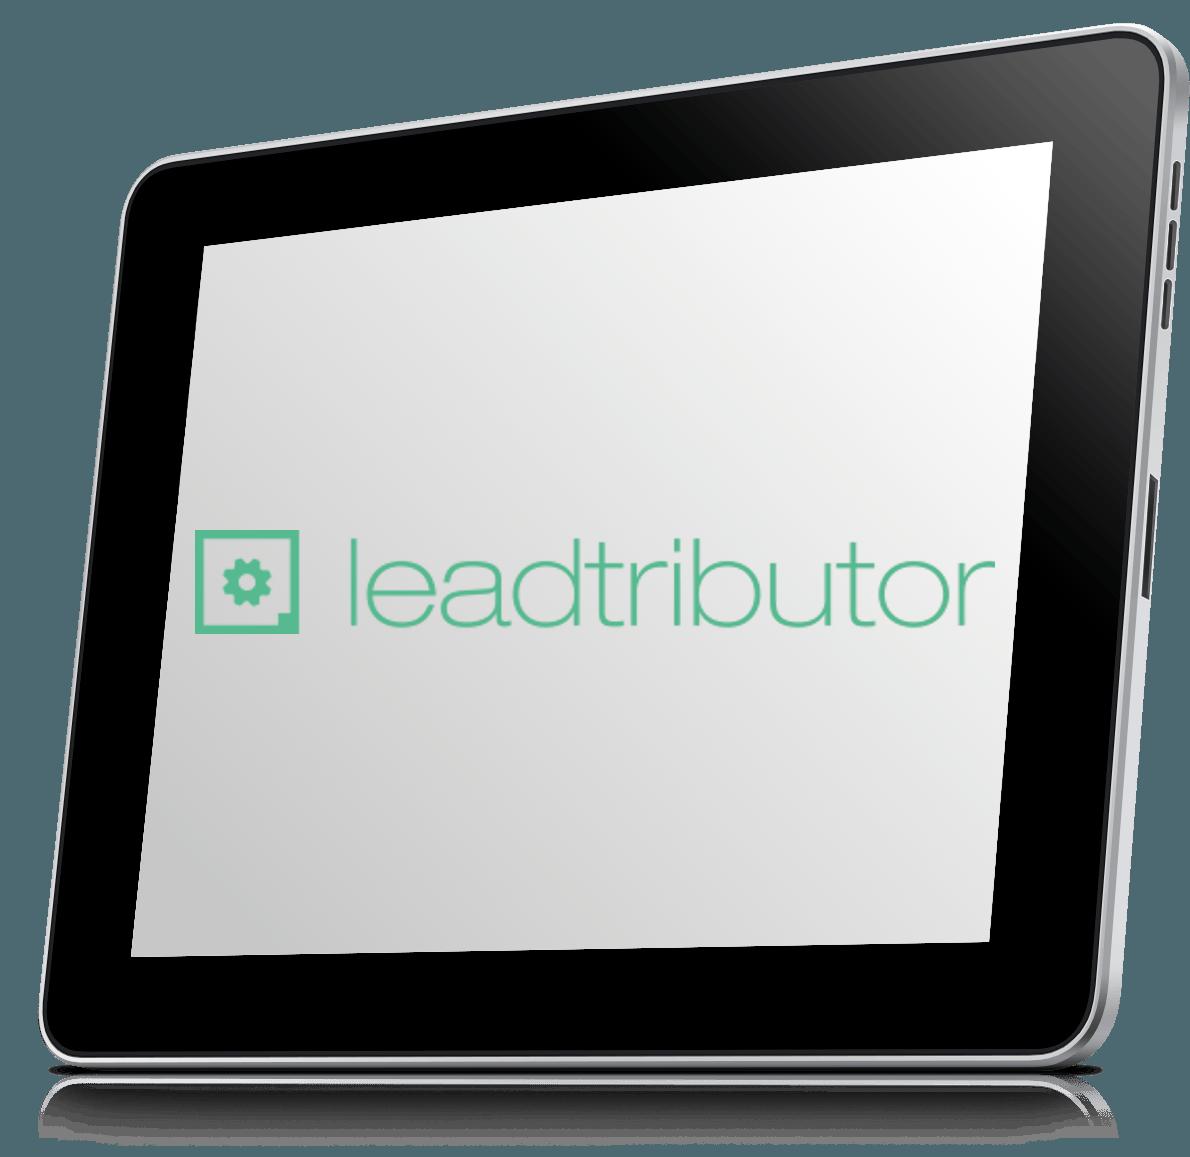 https://www.leadtributor.com/wp-content/uploads/leadtributor-ipad.png